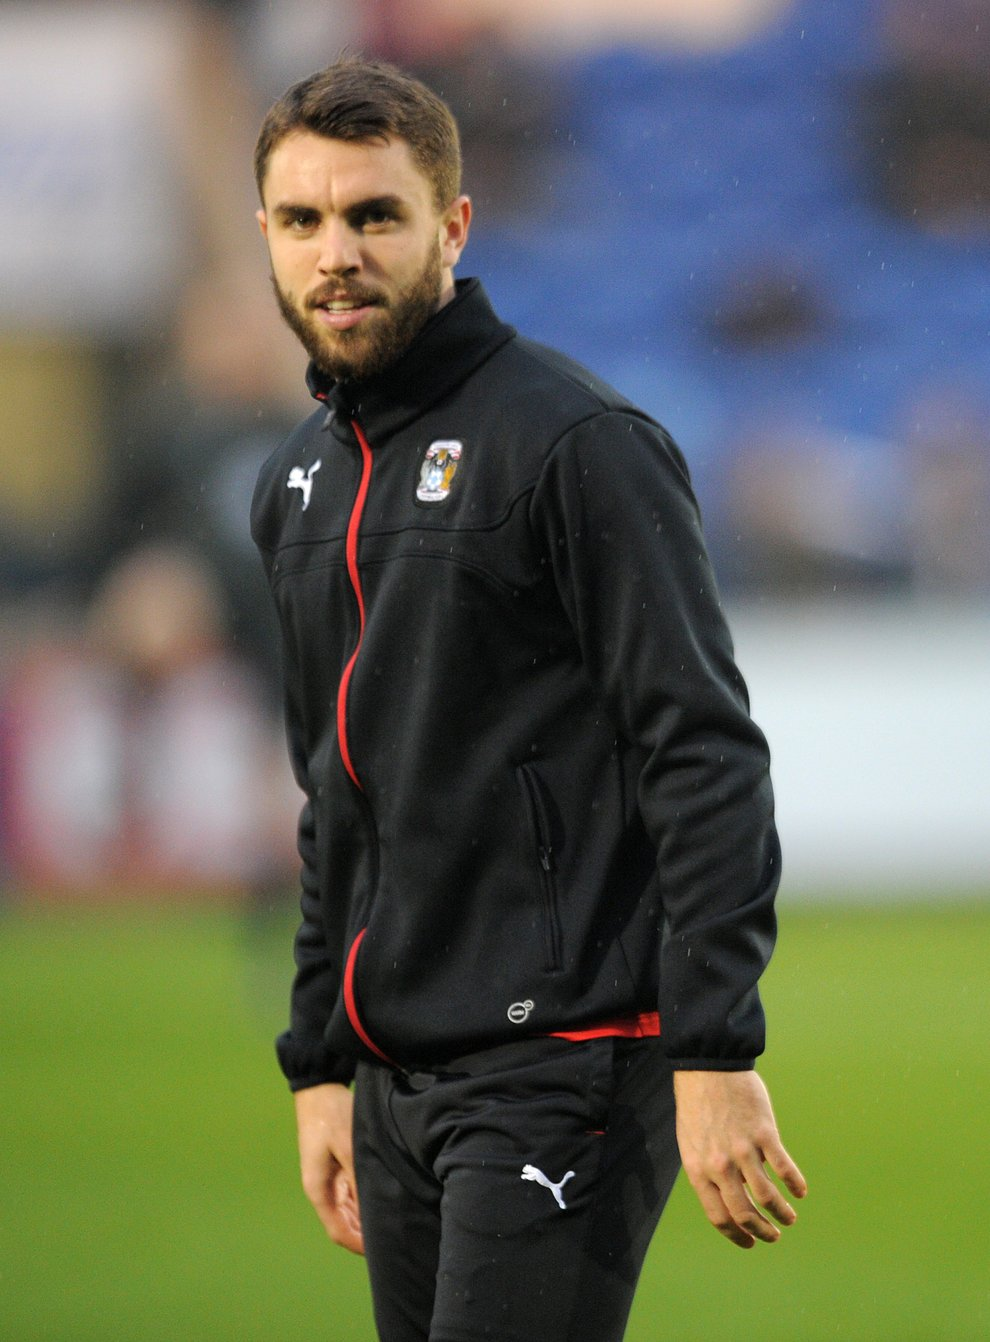 Josh McQuoid scored Weymouth's last goal (John Buckle/PA)